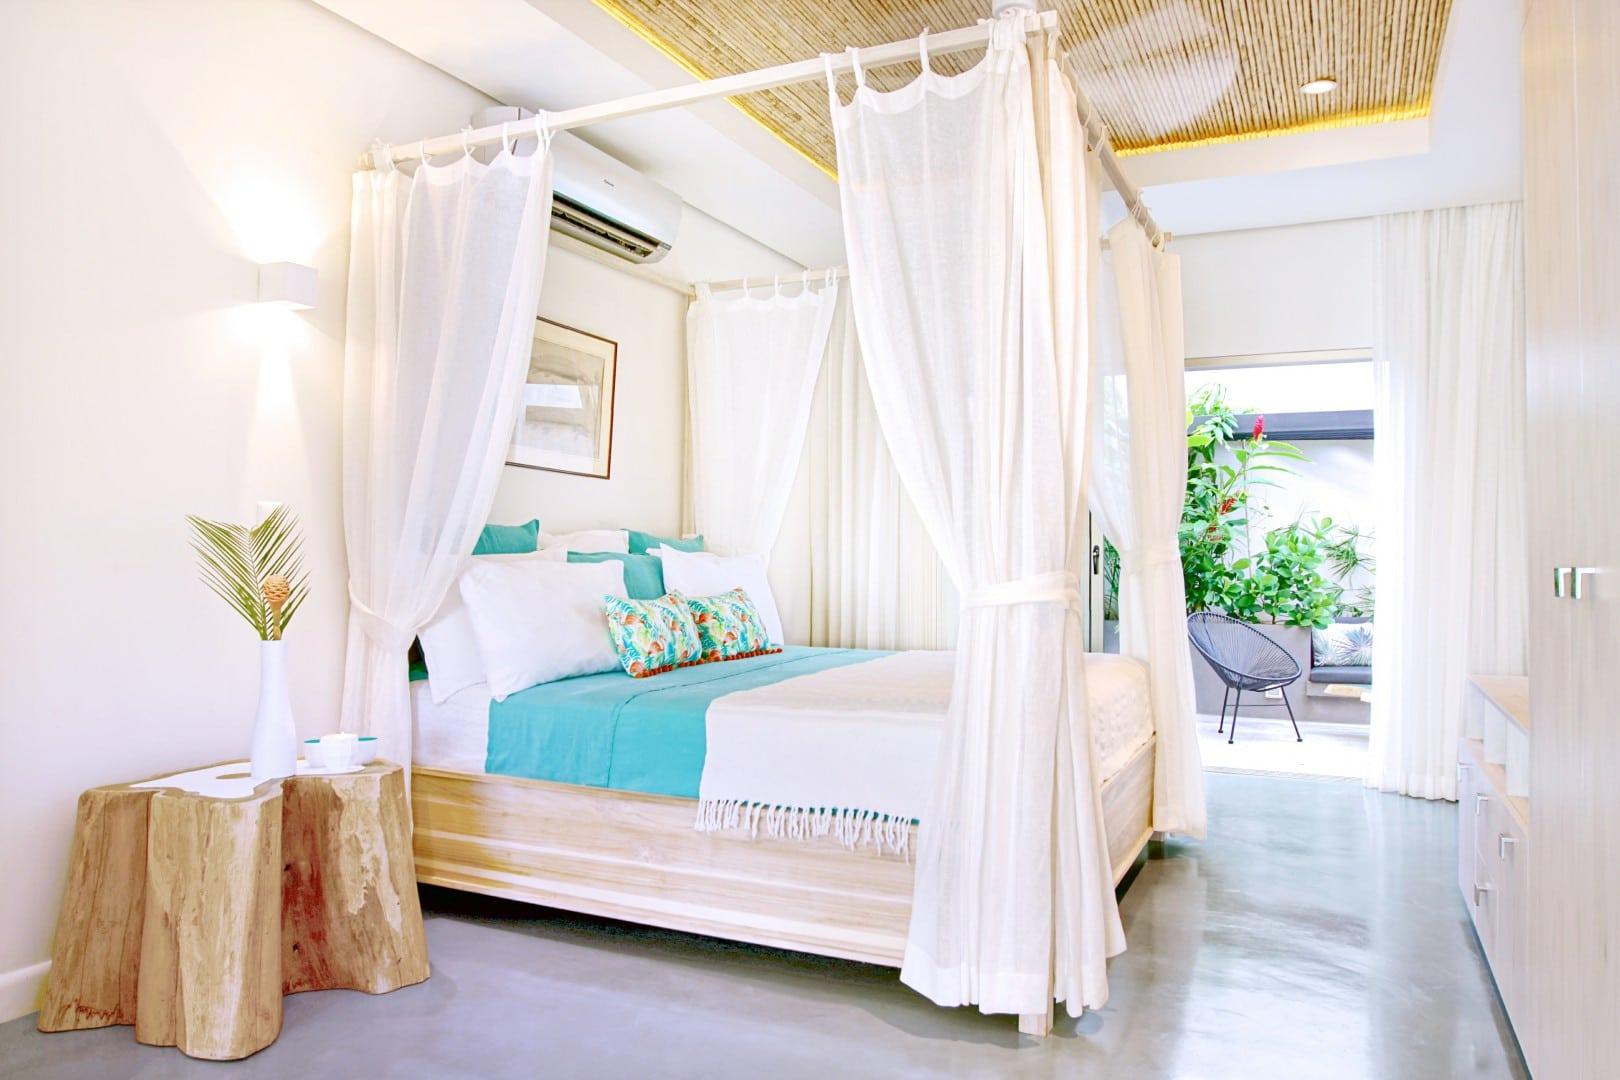 Casa Frisons Bougainville Room